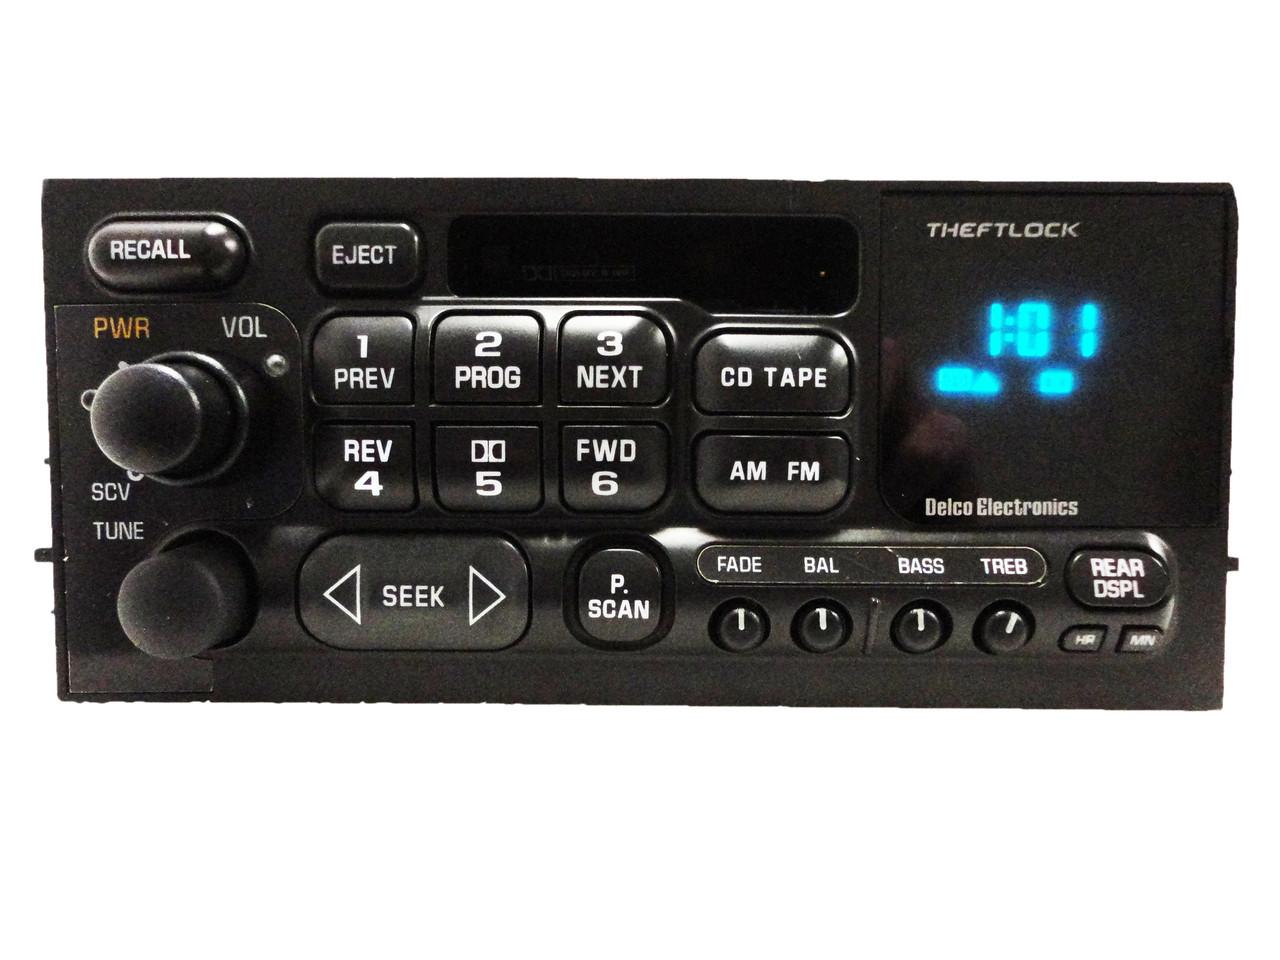 95 96 97 98 01 02 Chevy Cadillac GMC Radio Tape Player